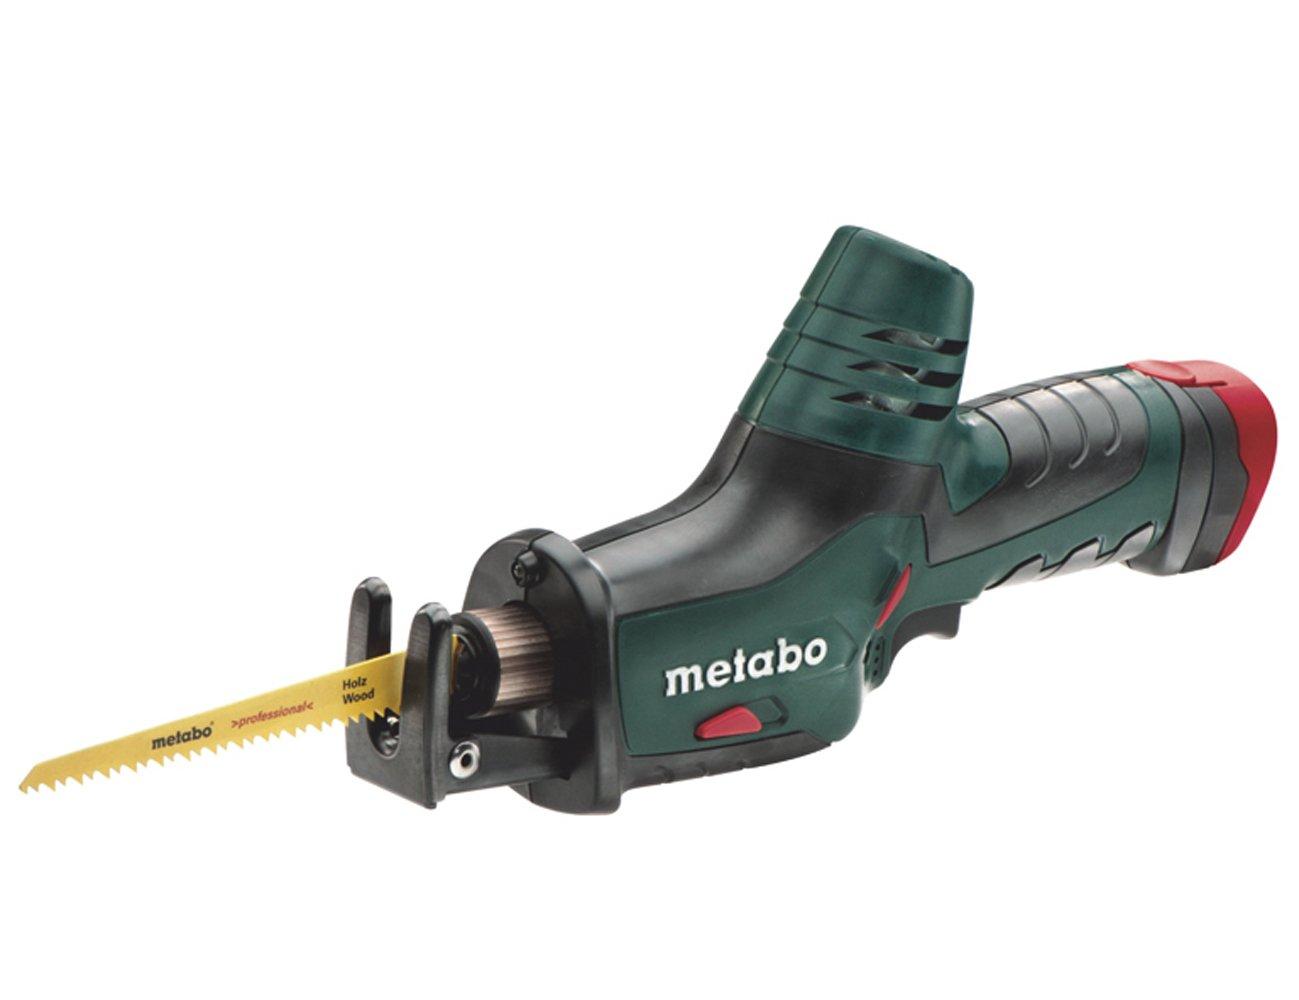 Metabo 602264500 AkkuSäbelsäge PowerMaxx ASE  BaumarktBewertungen und Beschreibung